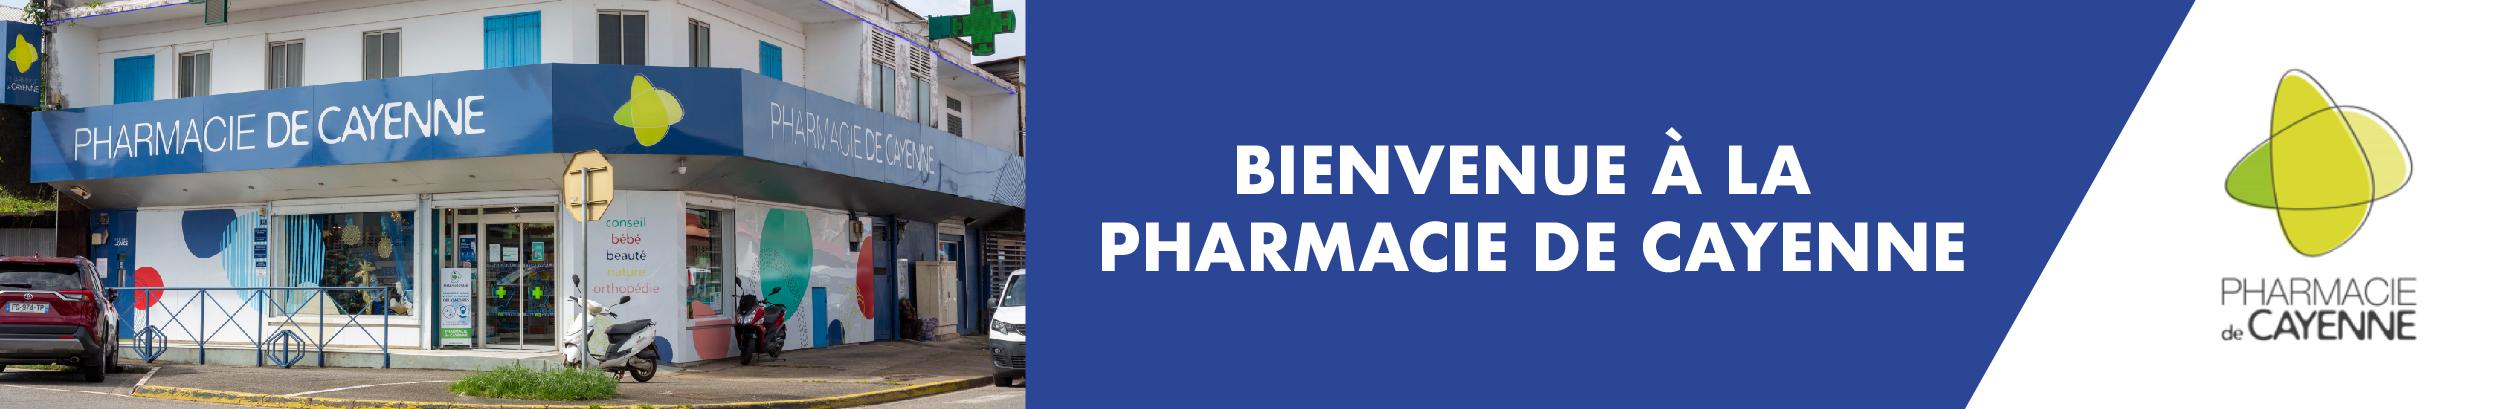 Bannière Pharma Guyane 18